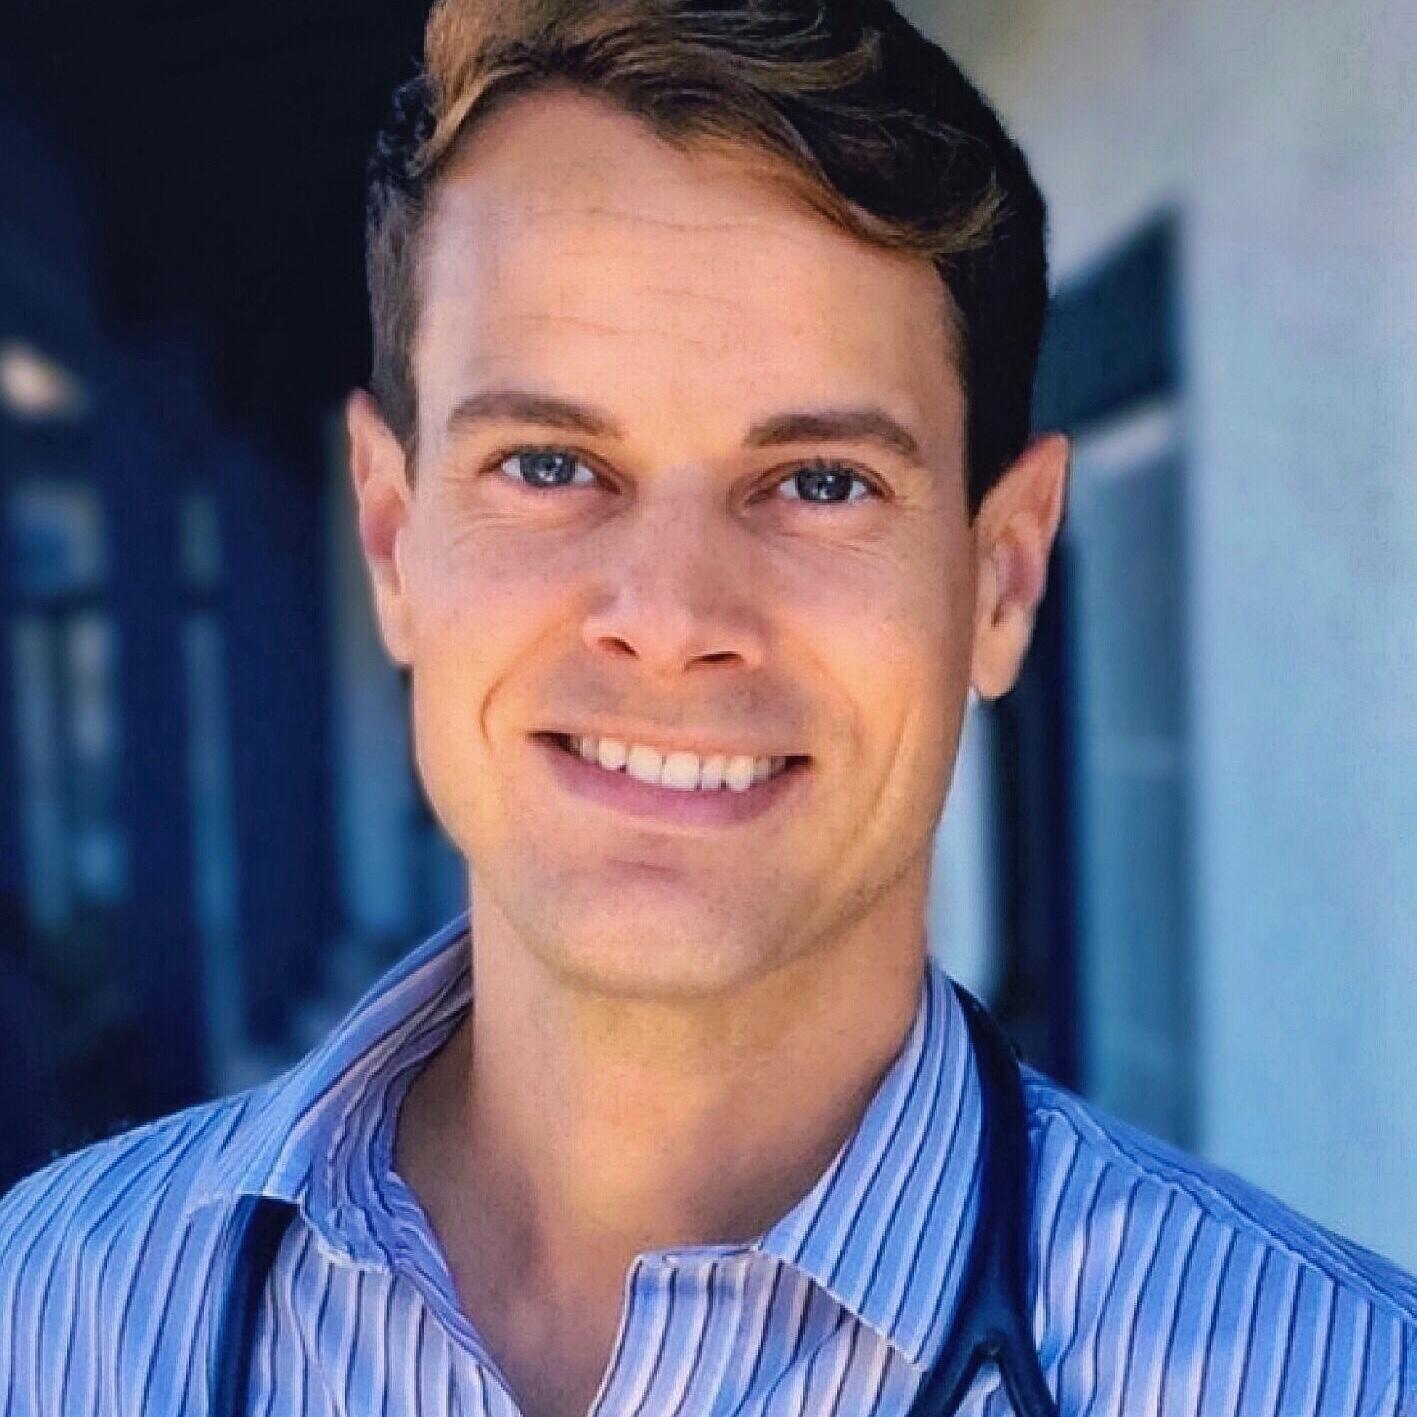 Dr. Joseph Scarpuzzi